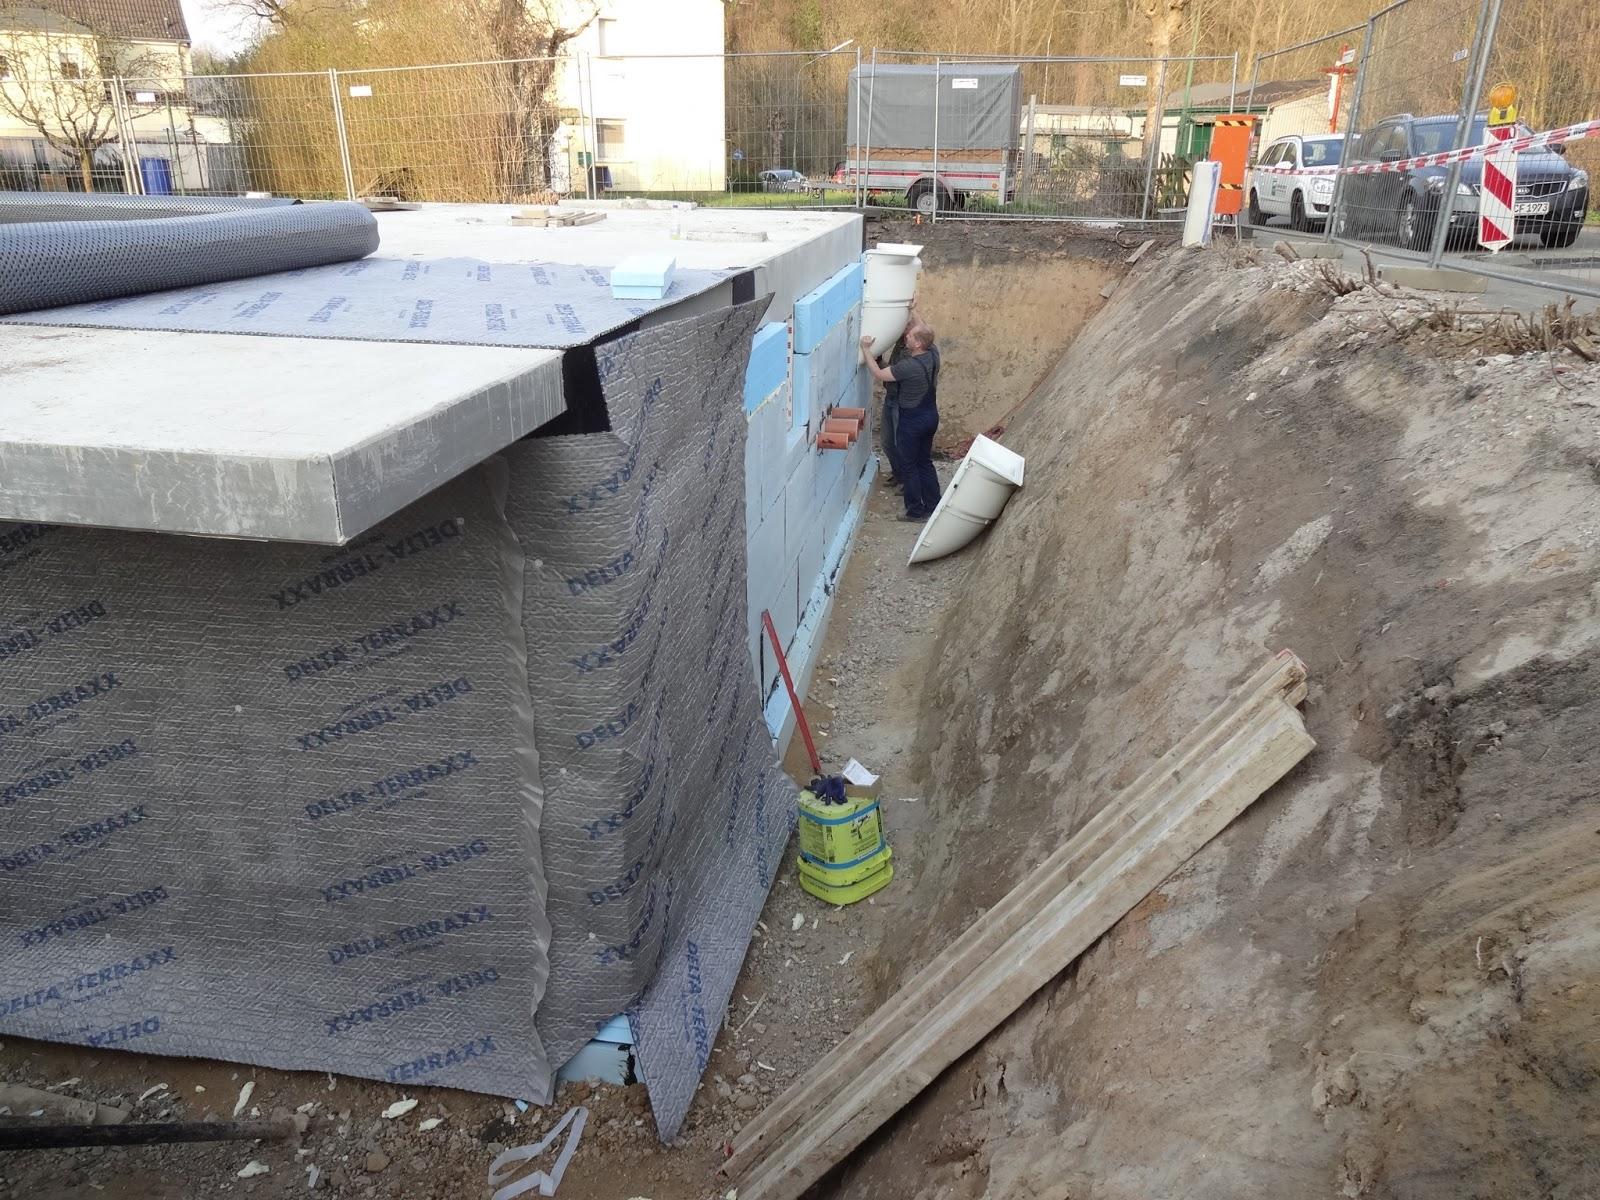 noppenbahn verlegen anleitung noppenbahn verlegen 2018 ideopolis drainage verlegen anleitung. Black Bedroom Furniture Sets. Home Design Ideas